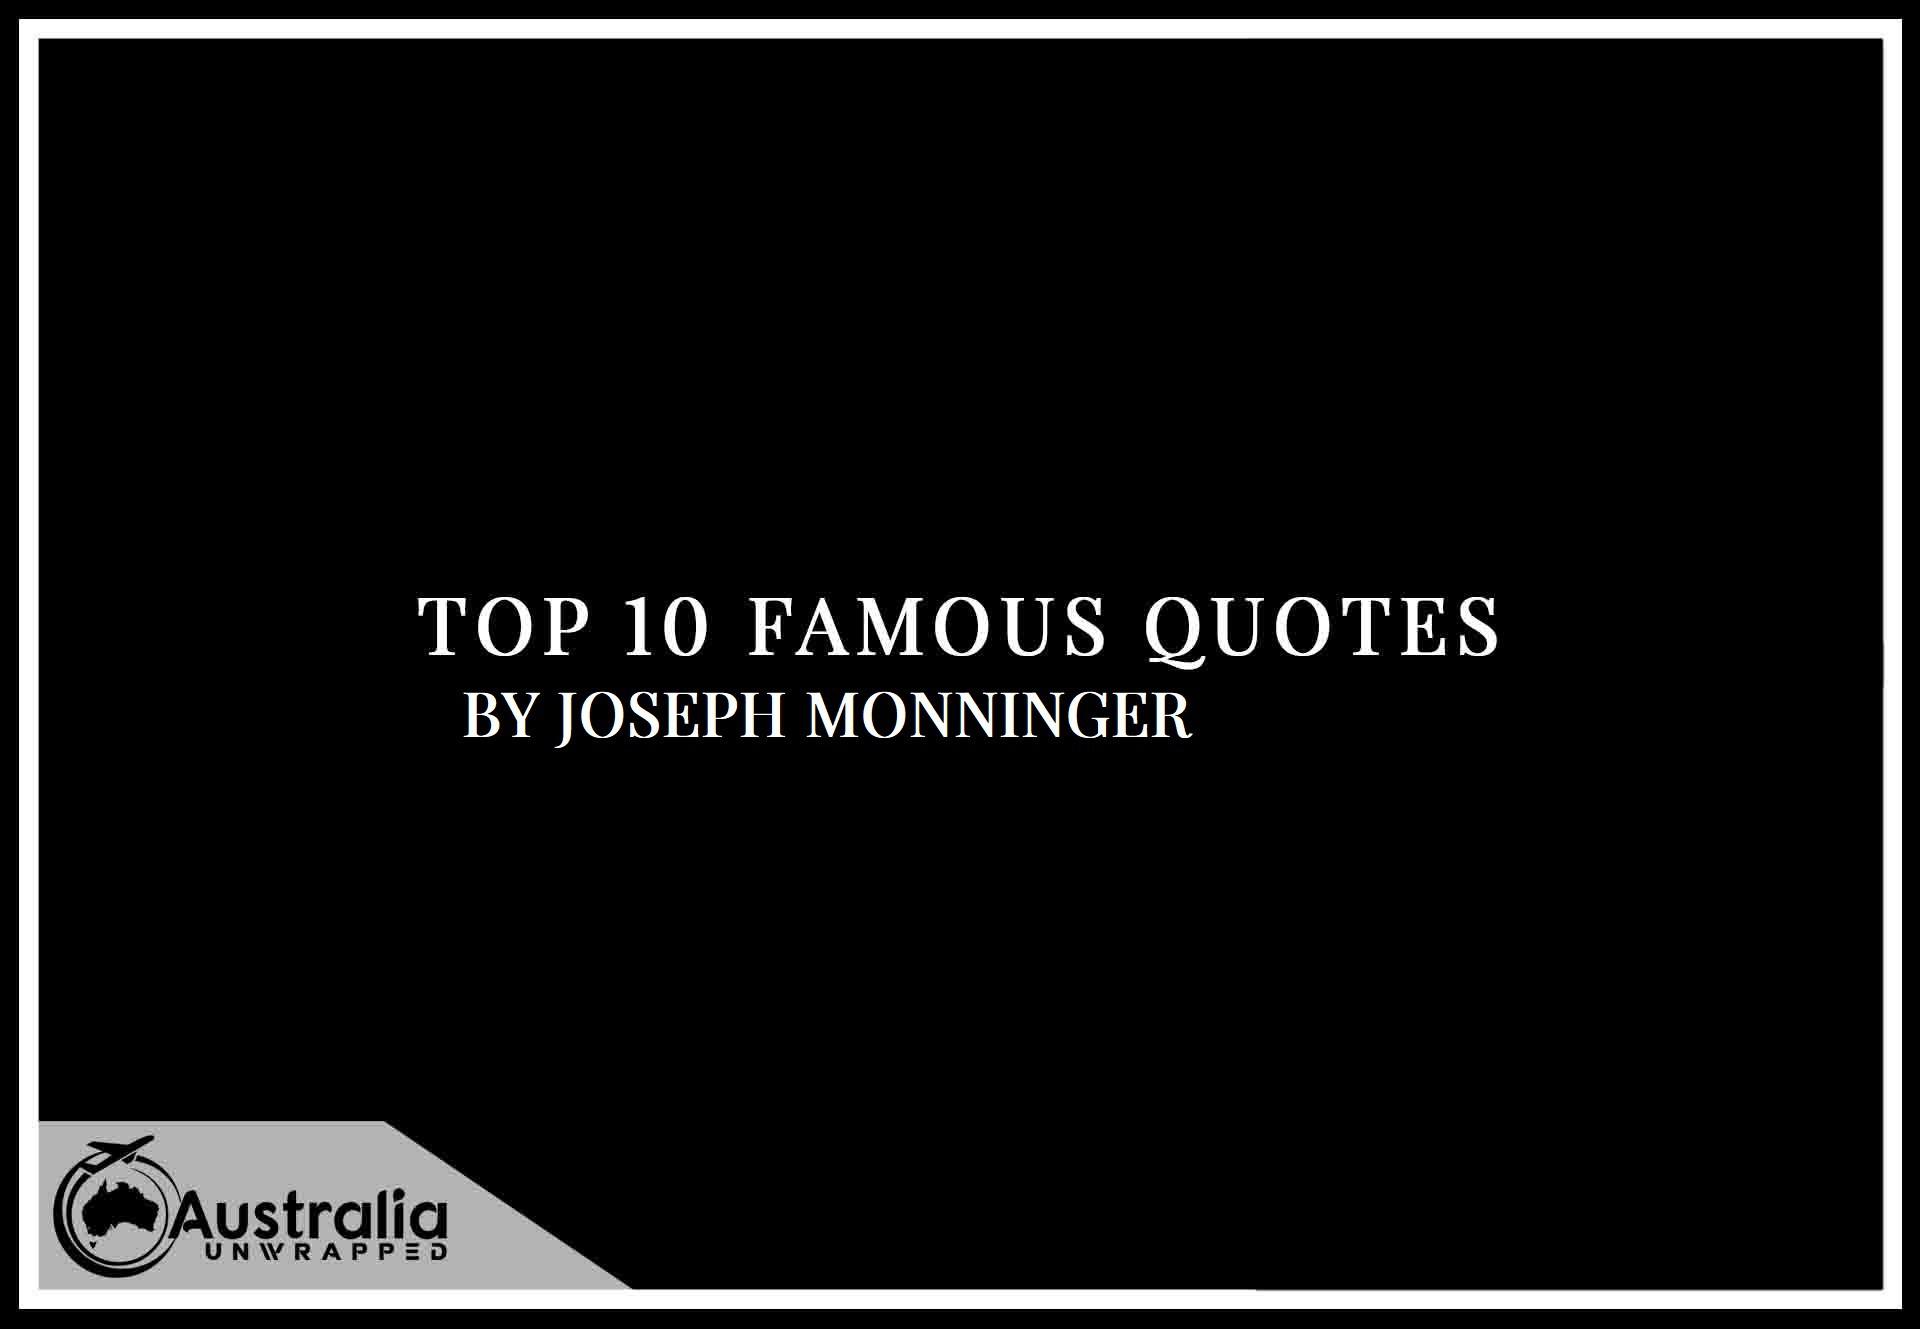 Top 10 Famous Quotes by Author Joseph Monninger